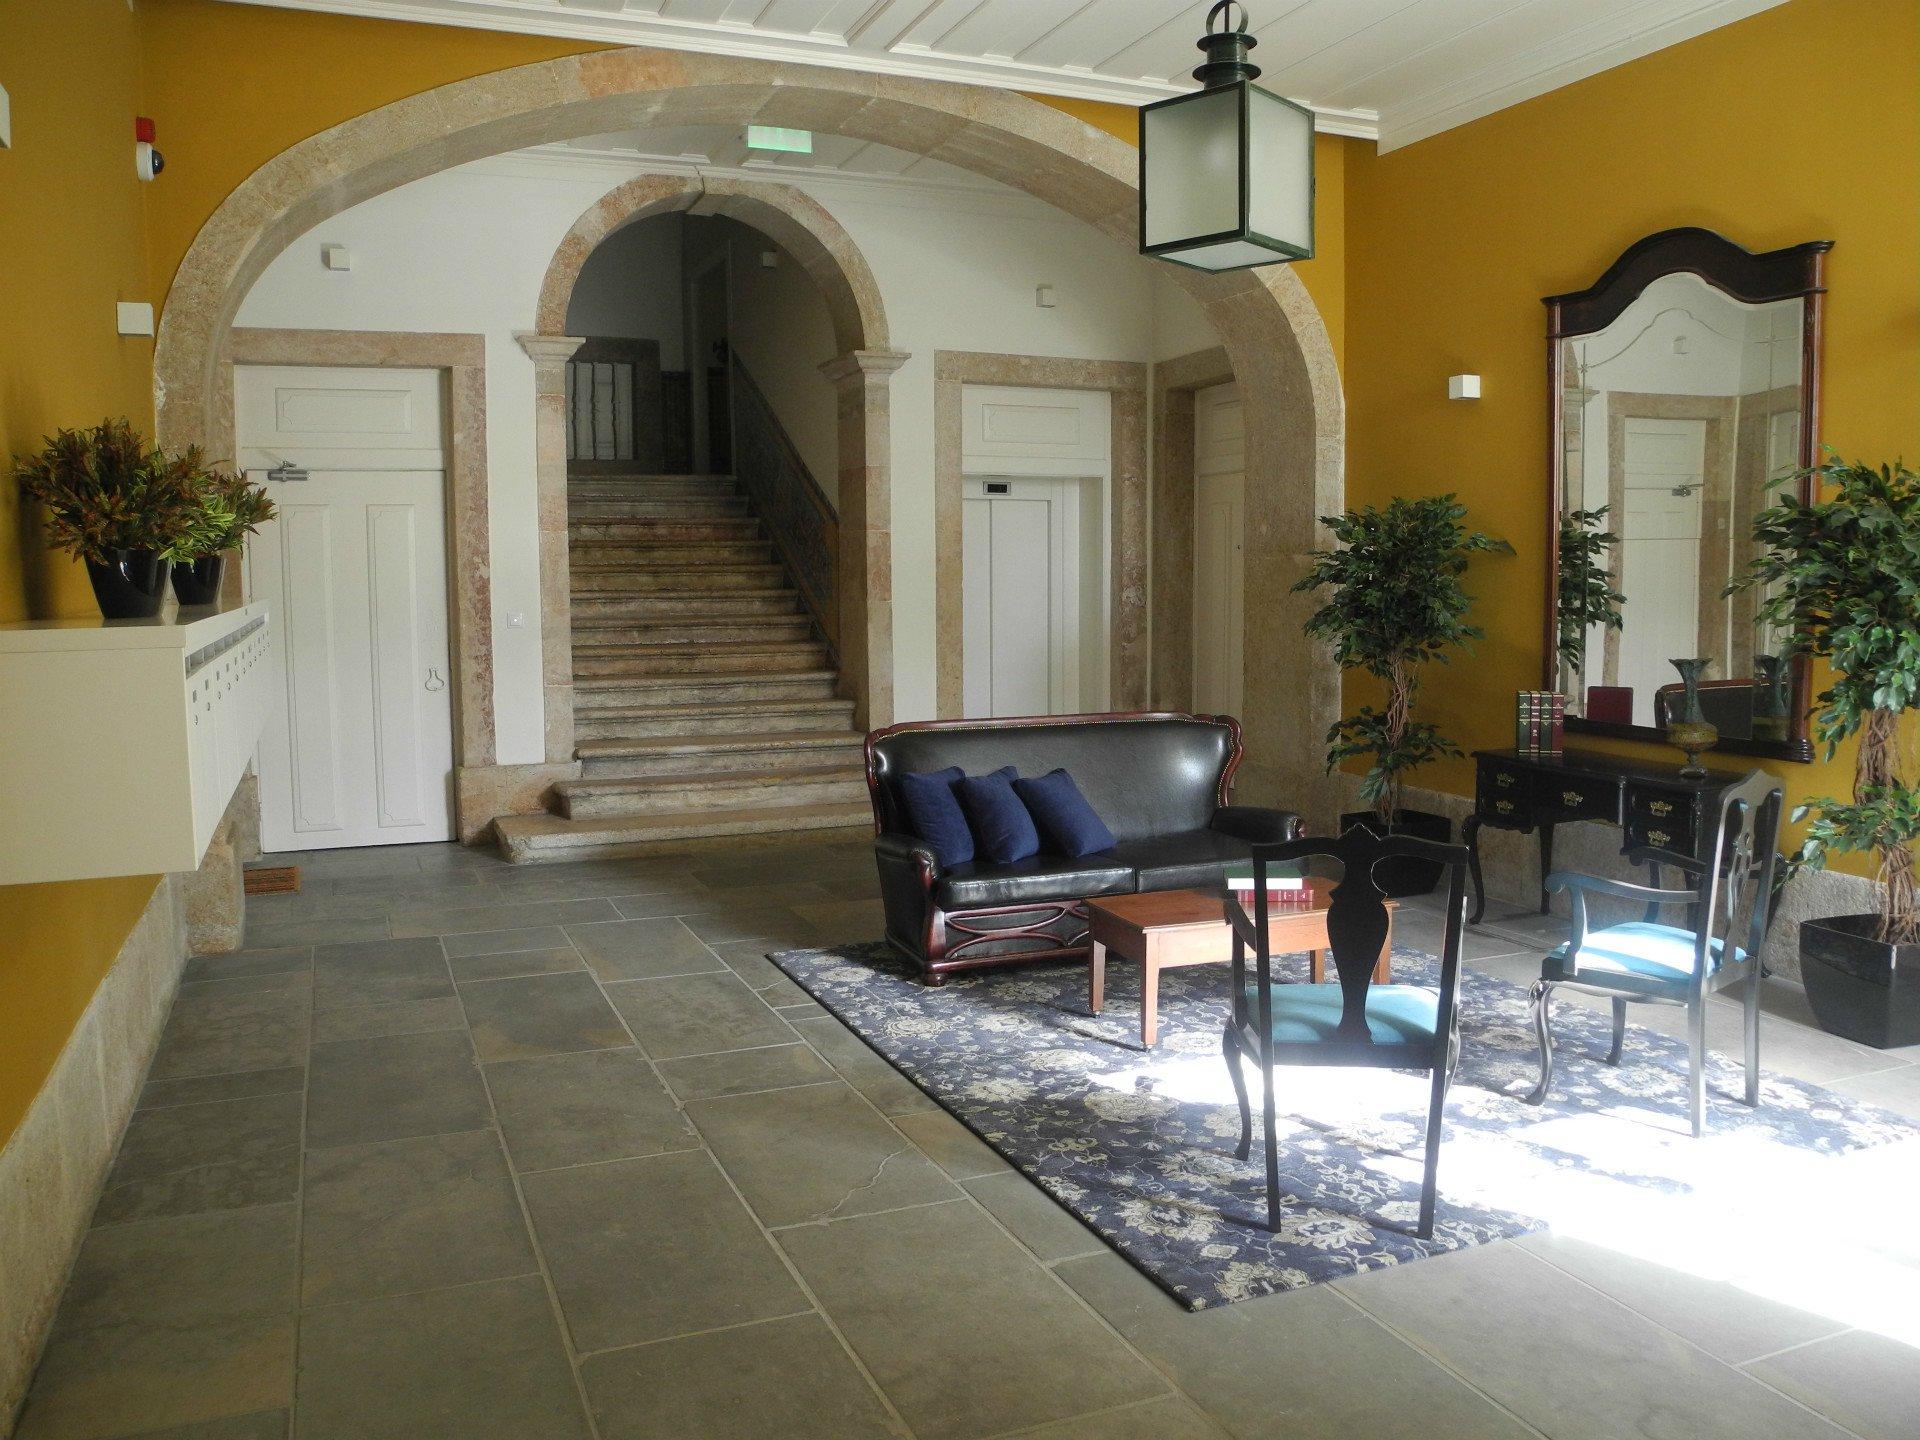 BuyPortugal Property:4 Bedroom Apartment Lisbon, Lisbon ...